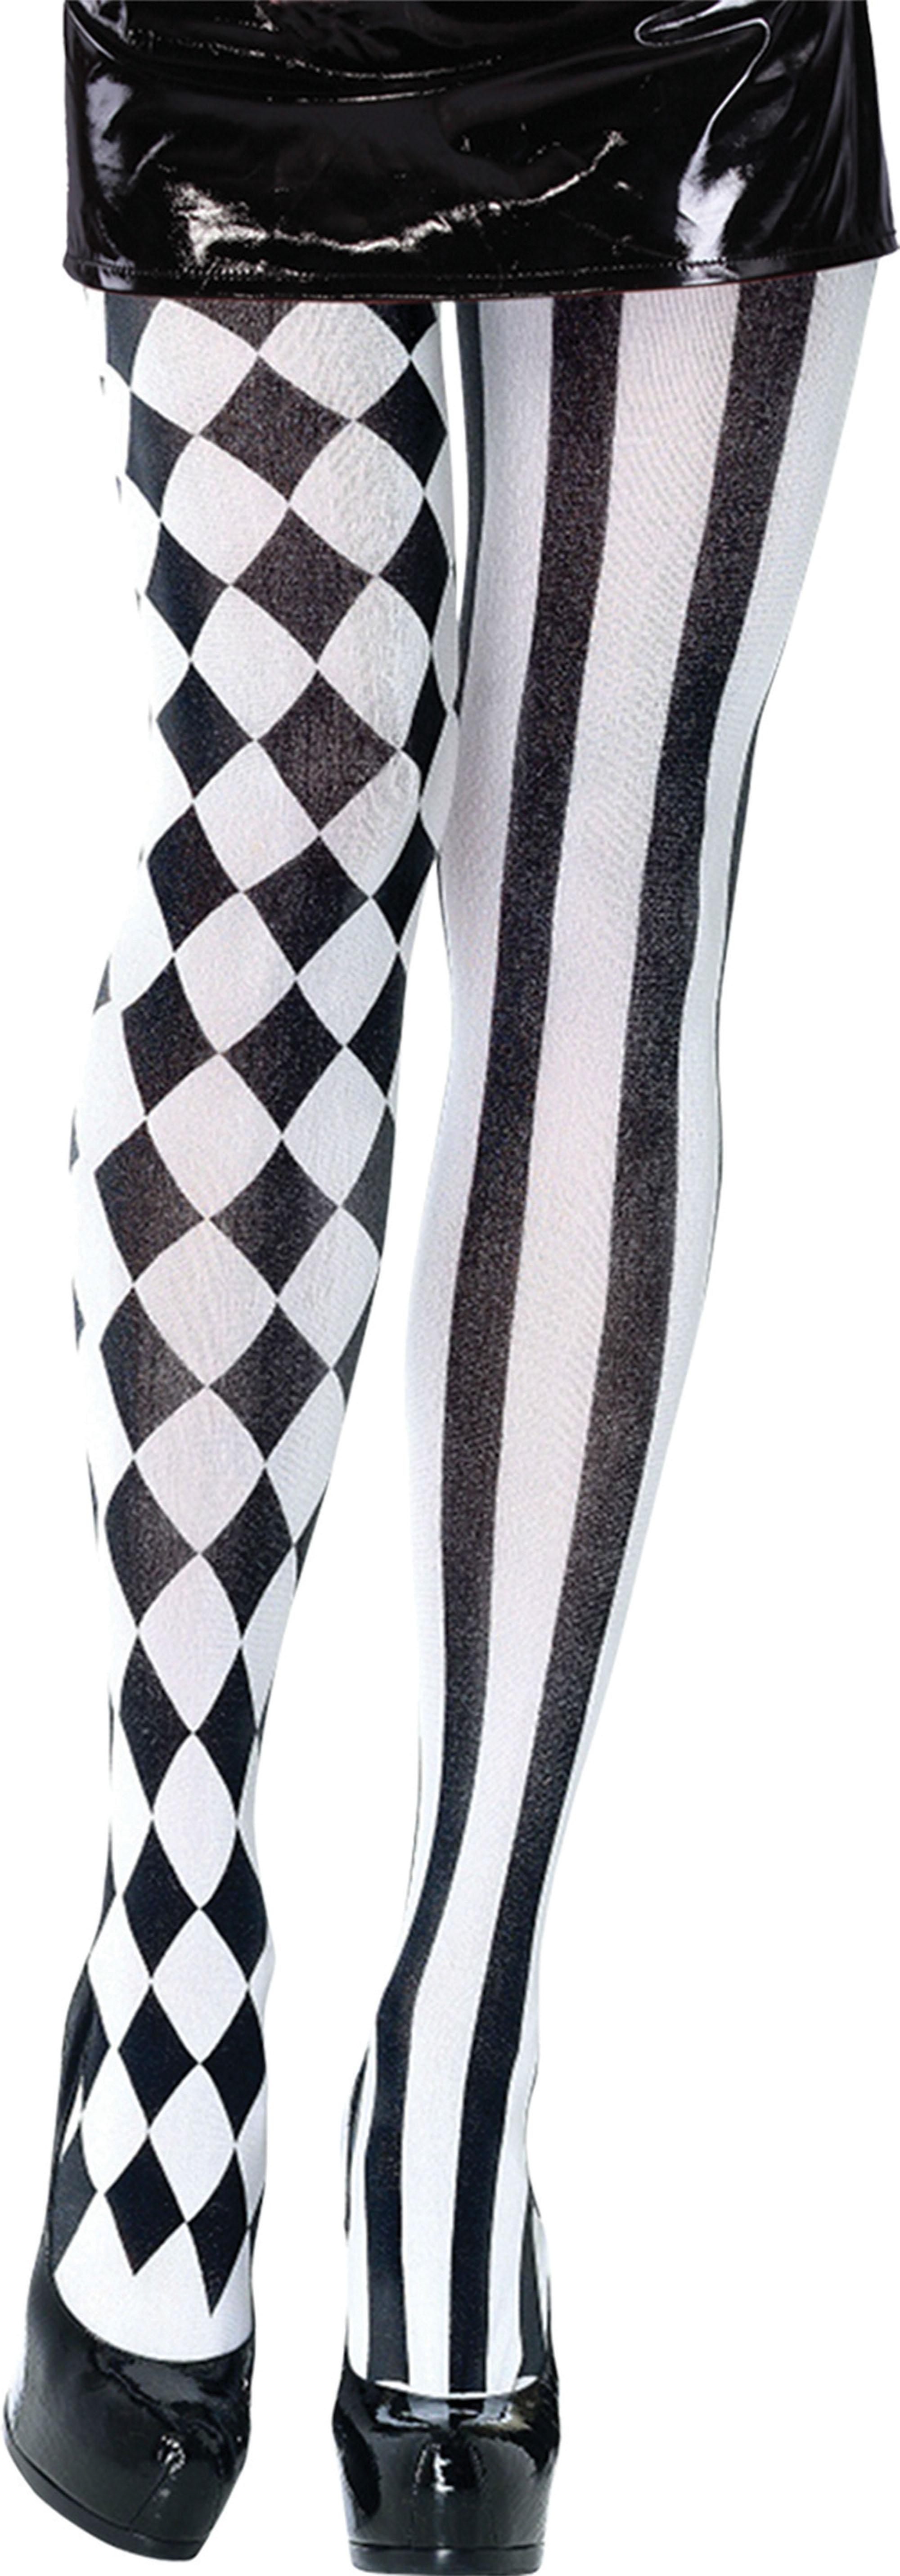 Female Black and White Harlequin Tights